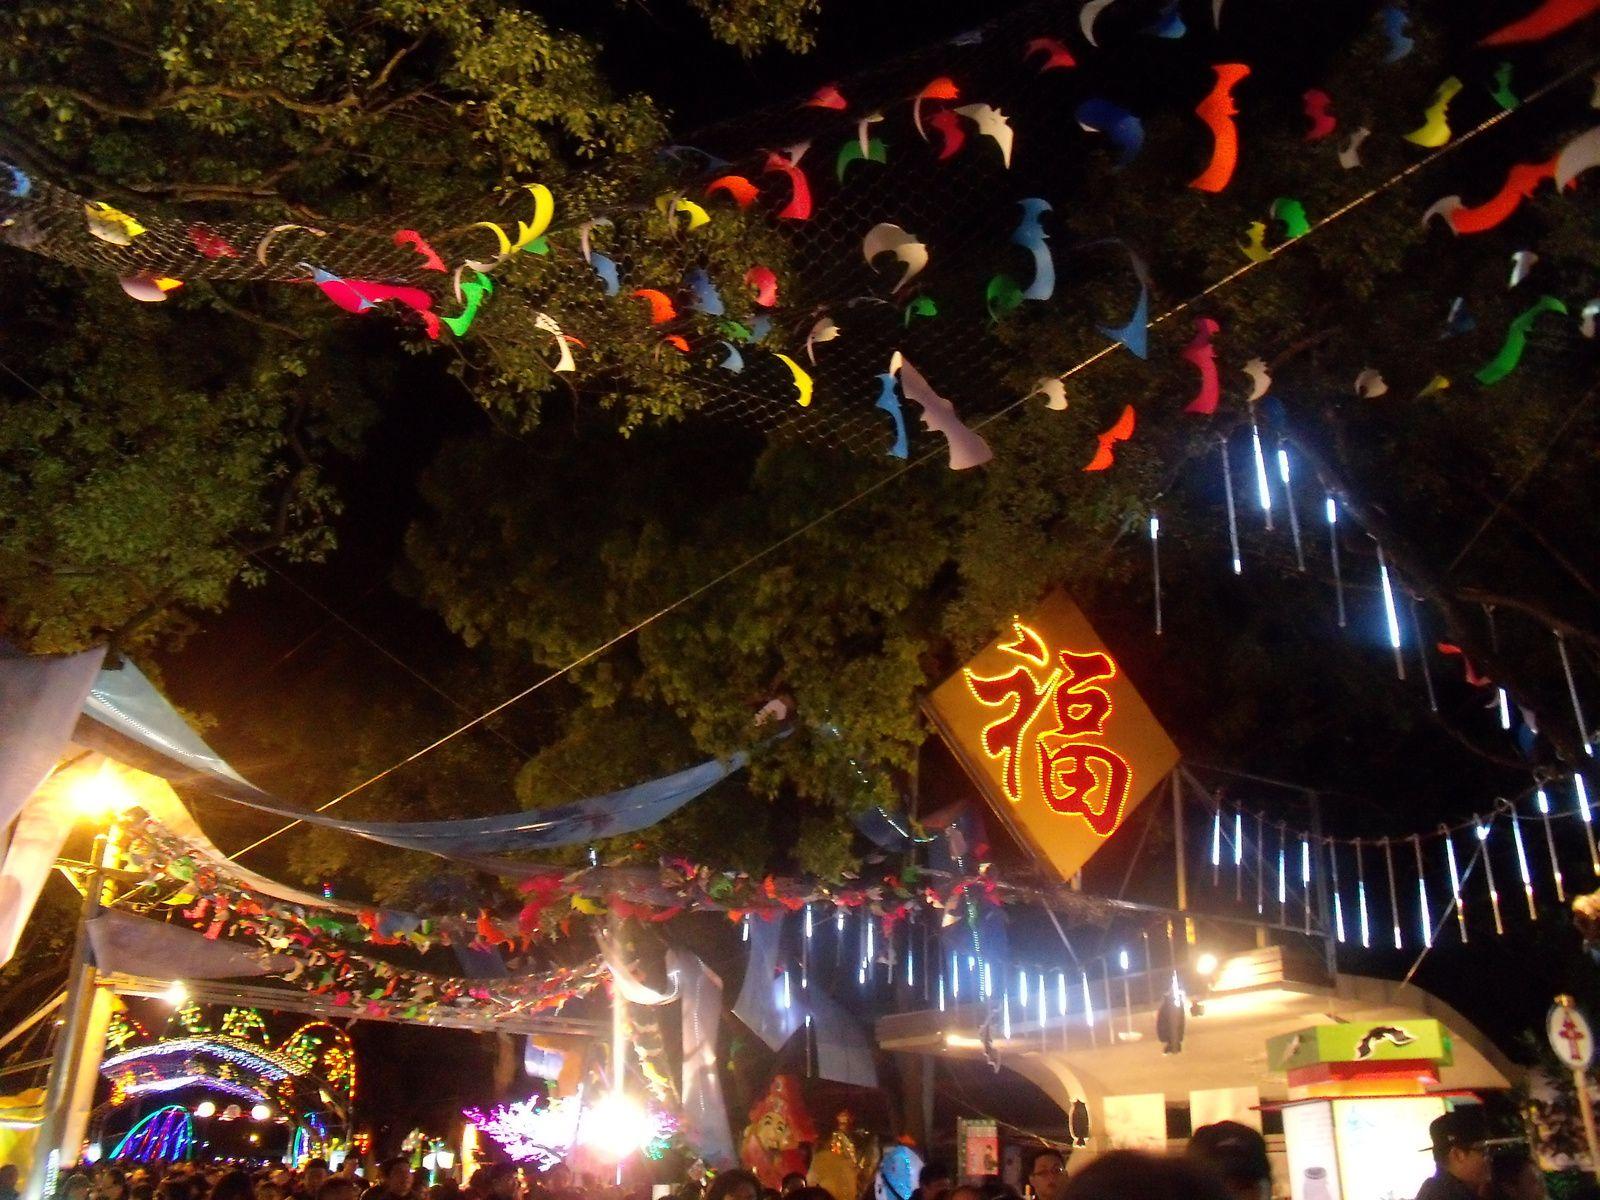 Festival des lanterne 2014